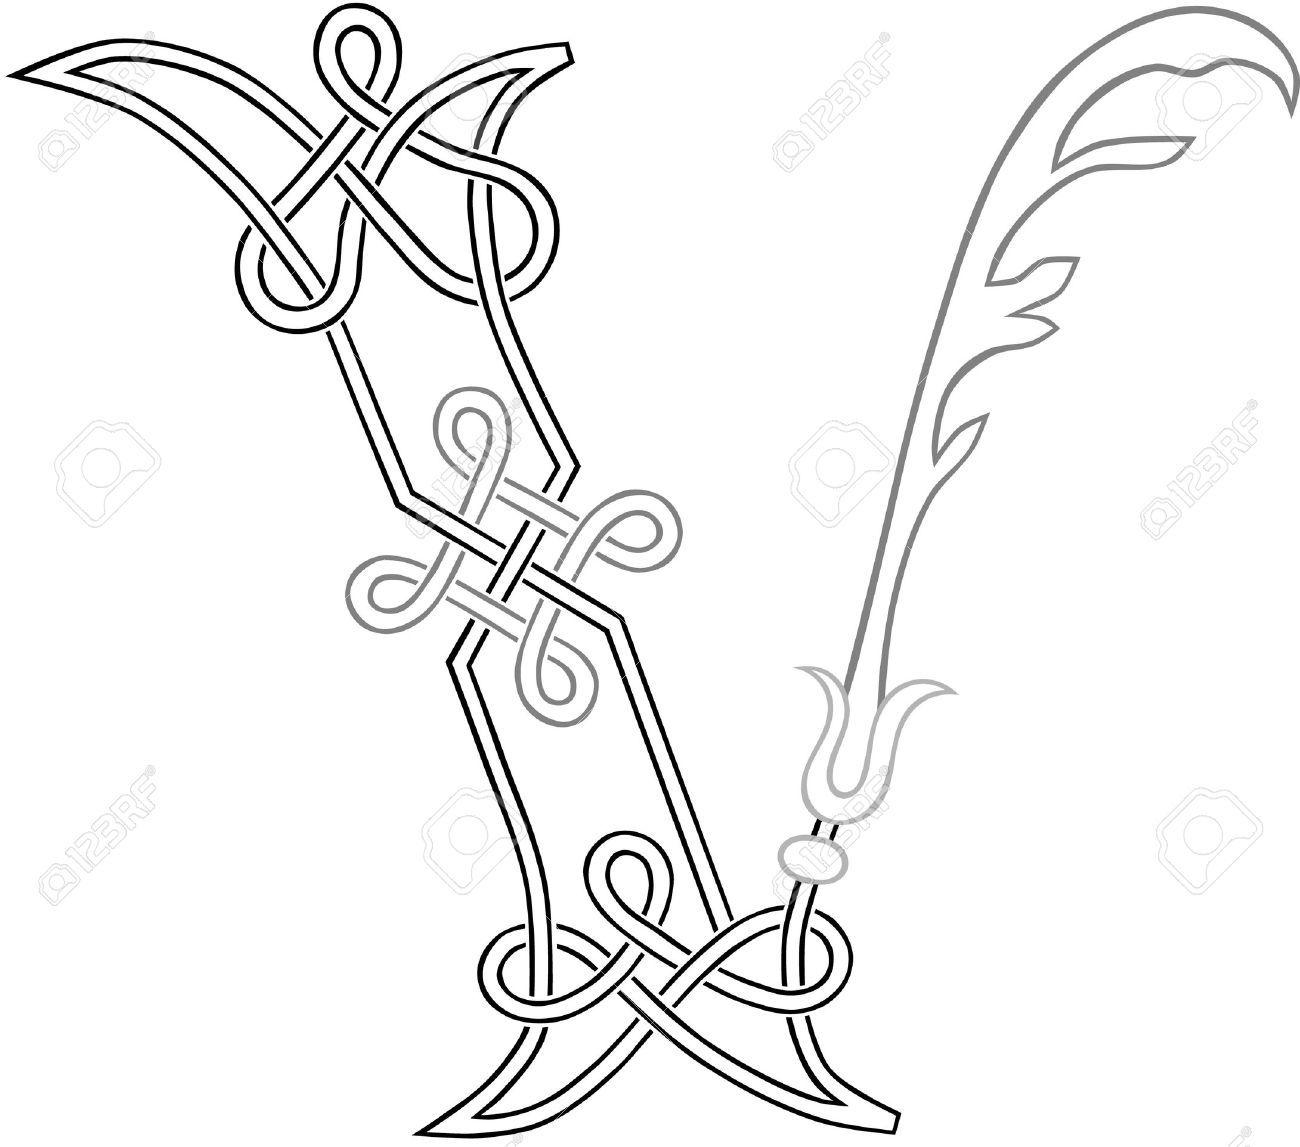 A Celtic Knot-work Capital Letter V Stylized Outline | celtic ...